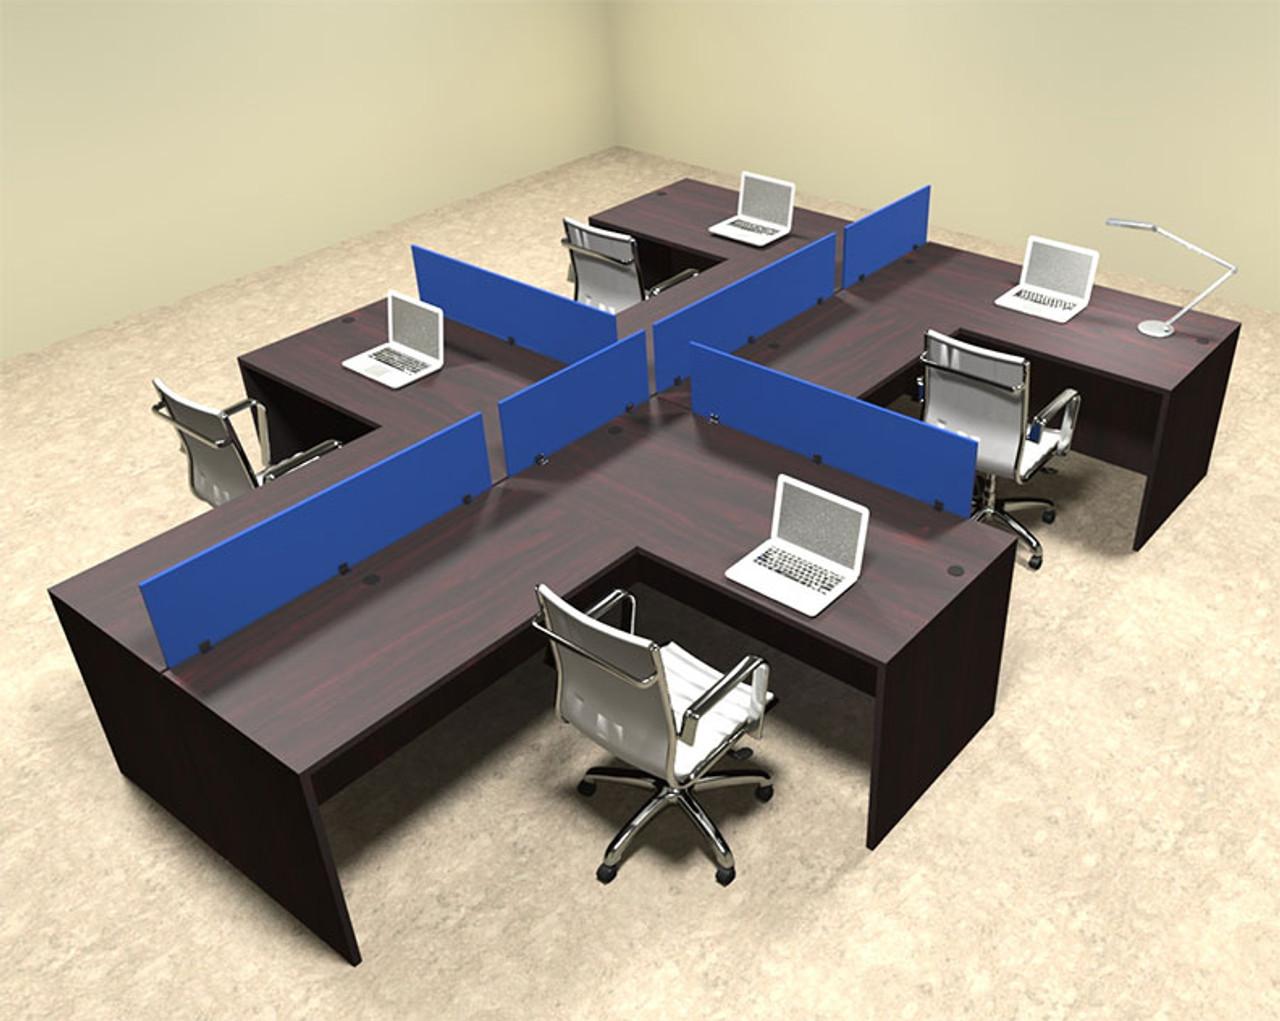 Four Person Blue Divider Office Workstation Desk Set, #OT-SUL-SPB47